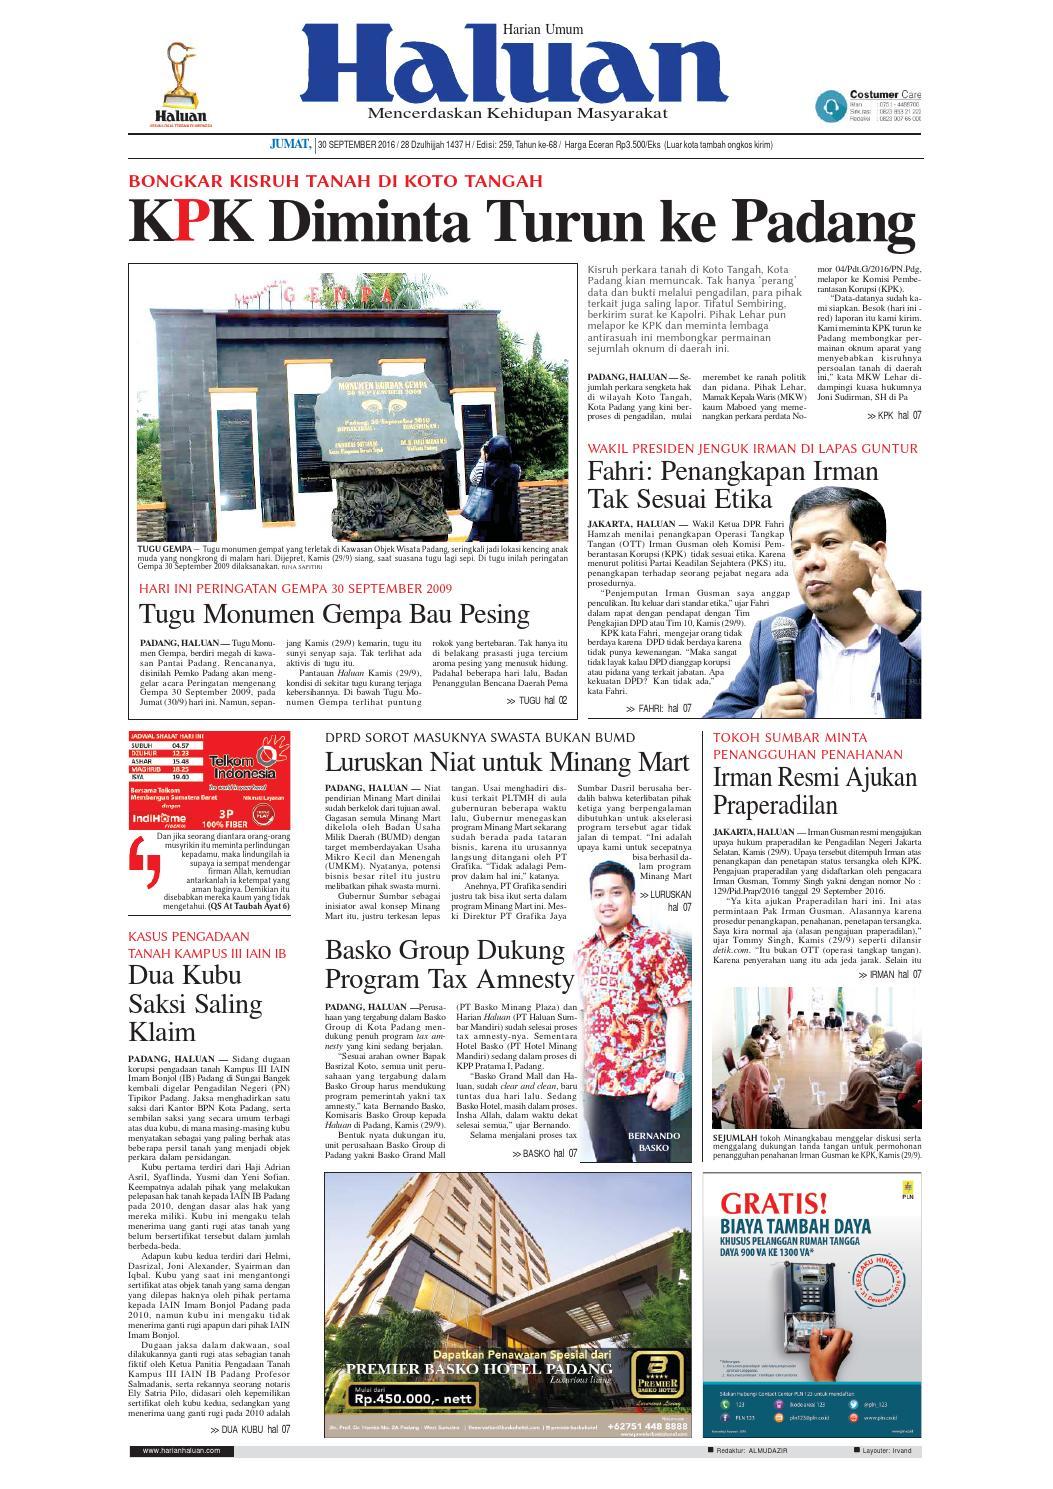 Haluan 30 September 2016 By Harian Issuu Produk Ukm Bumn Bahan Songket Sulam Katun Merah